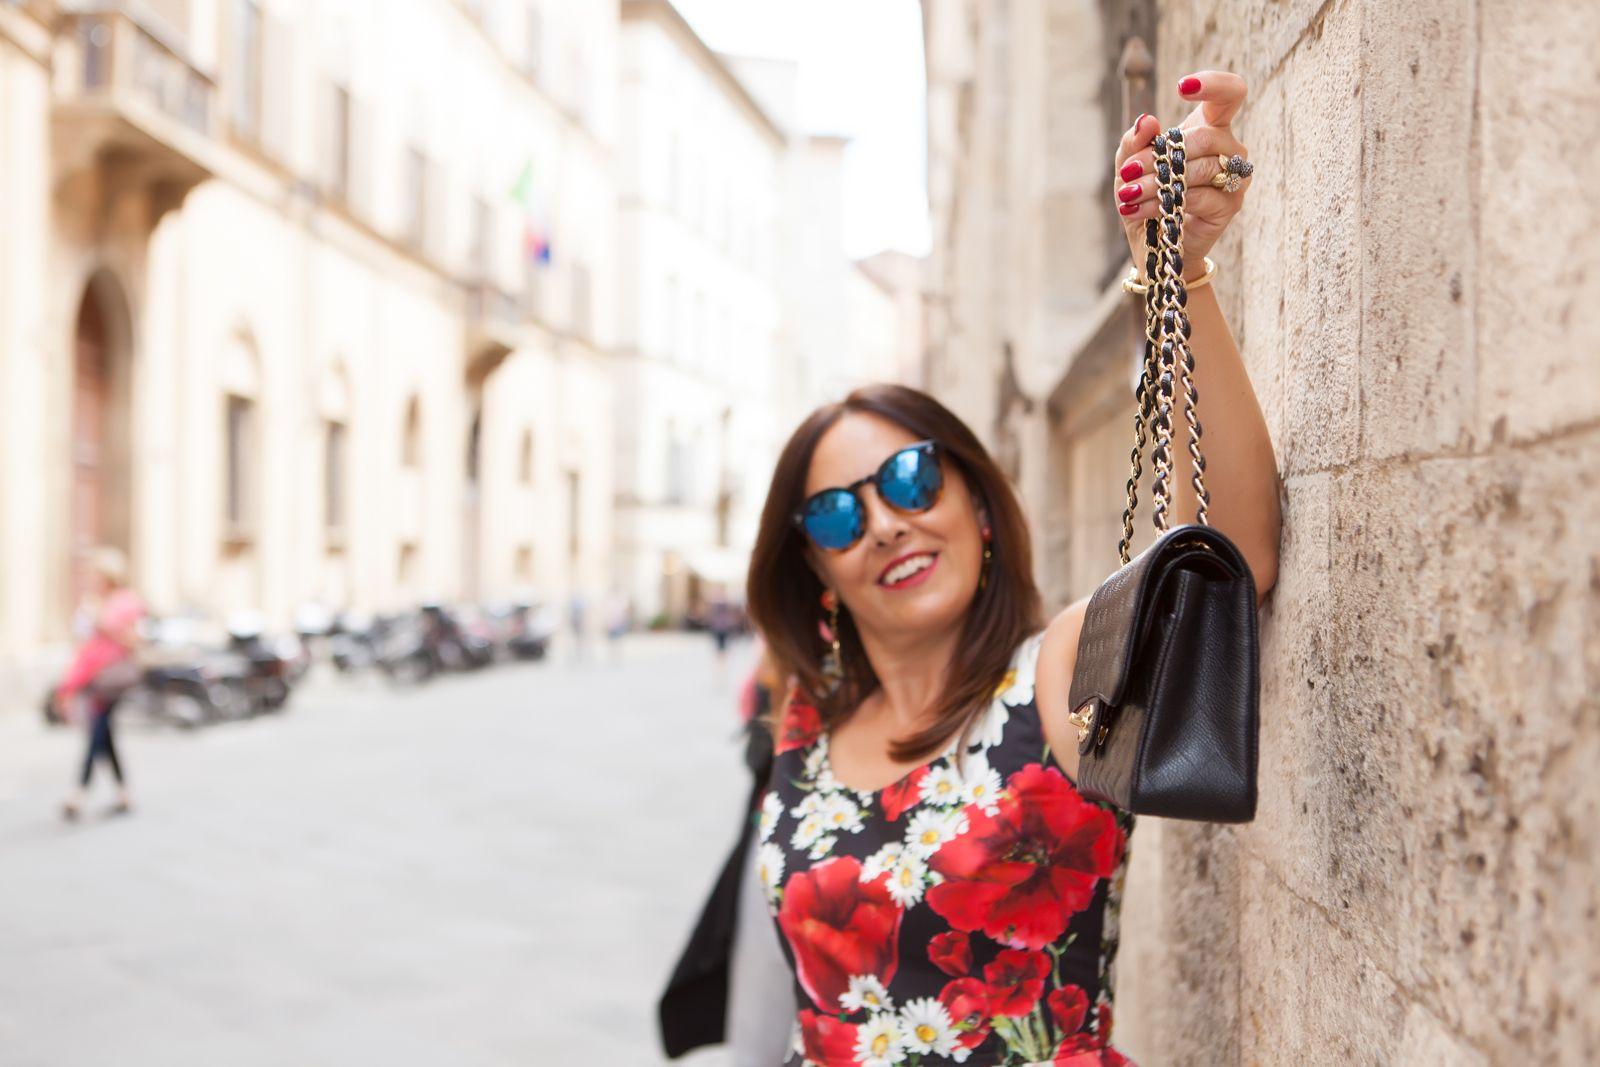 illesteva sunglasses, dolce gabbana flower dress, chanel bag. photo shooting in Siena - Not Only Twenty Fashion blog